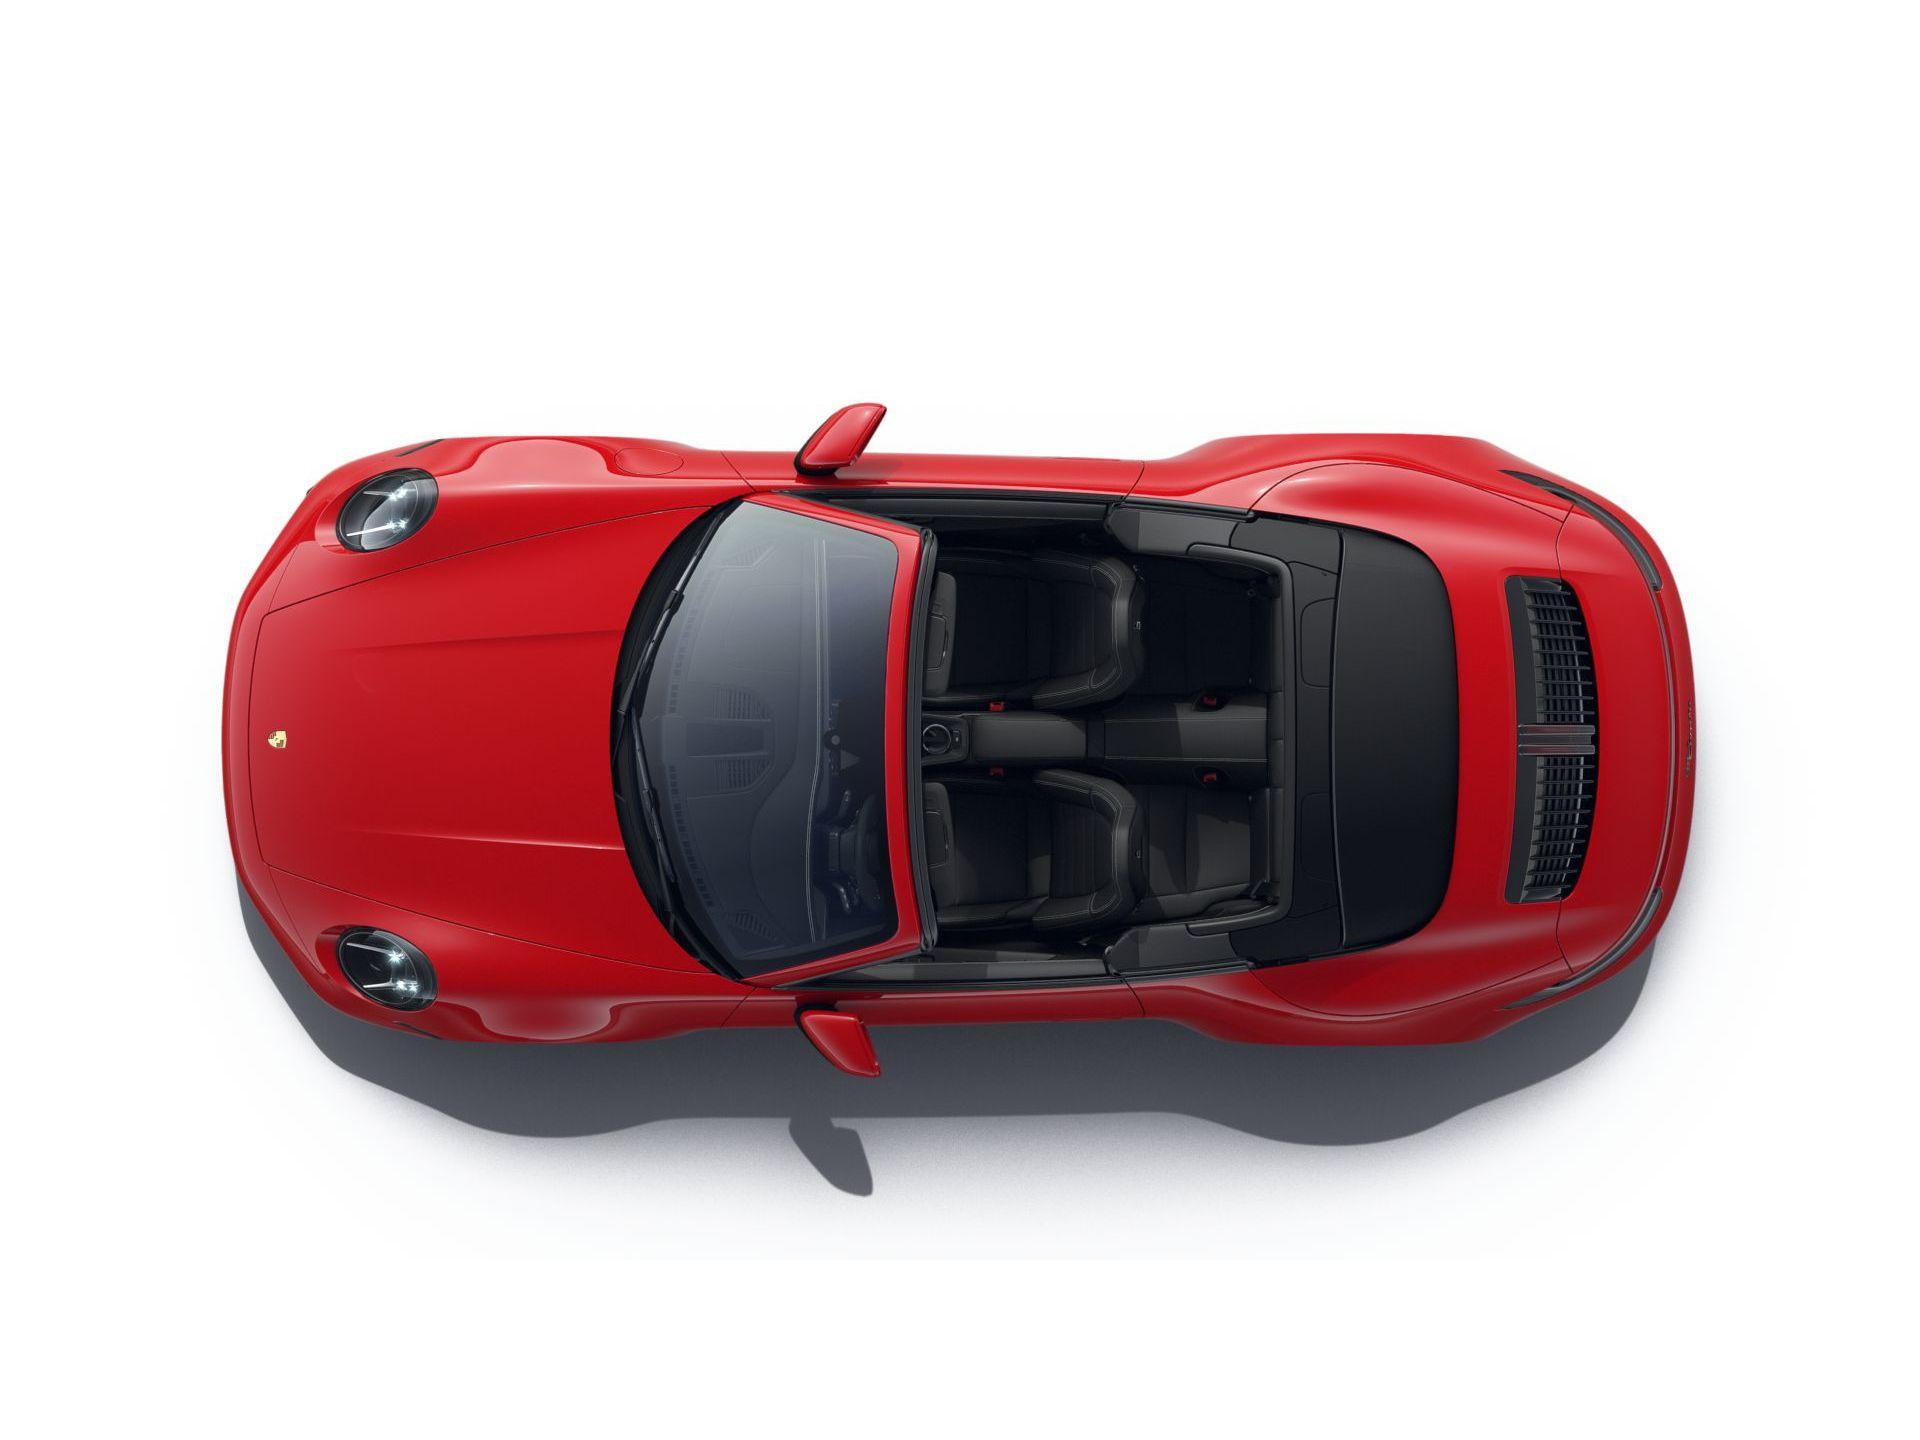 2022 Porsche 911 Carrera Cabriolet – 4